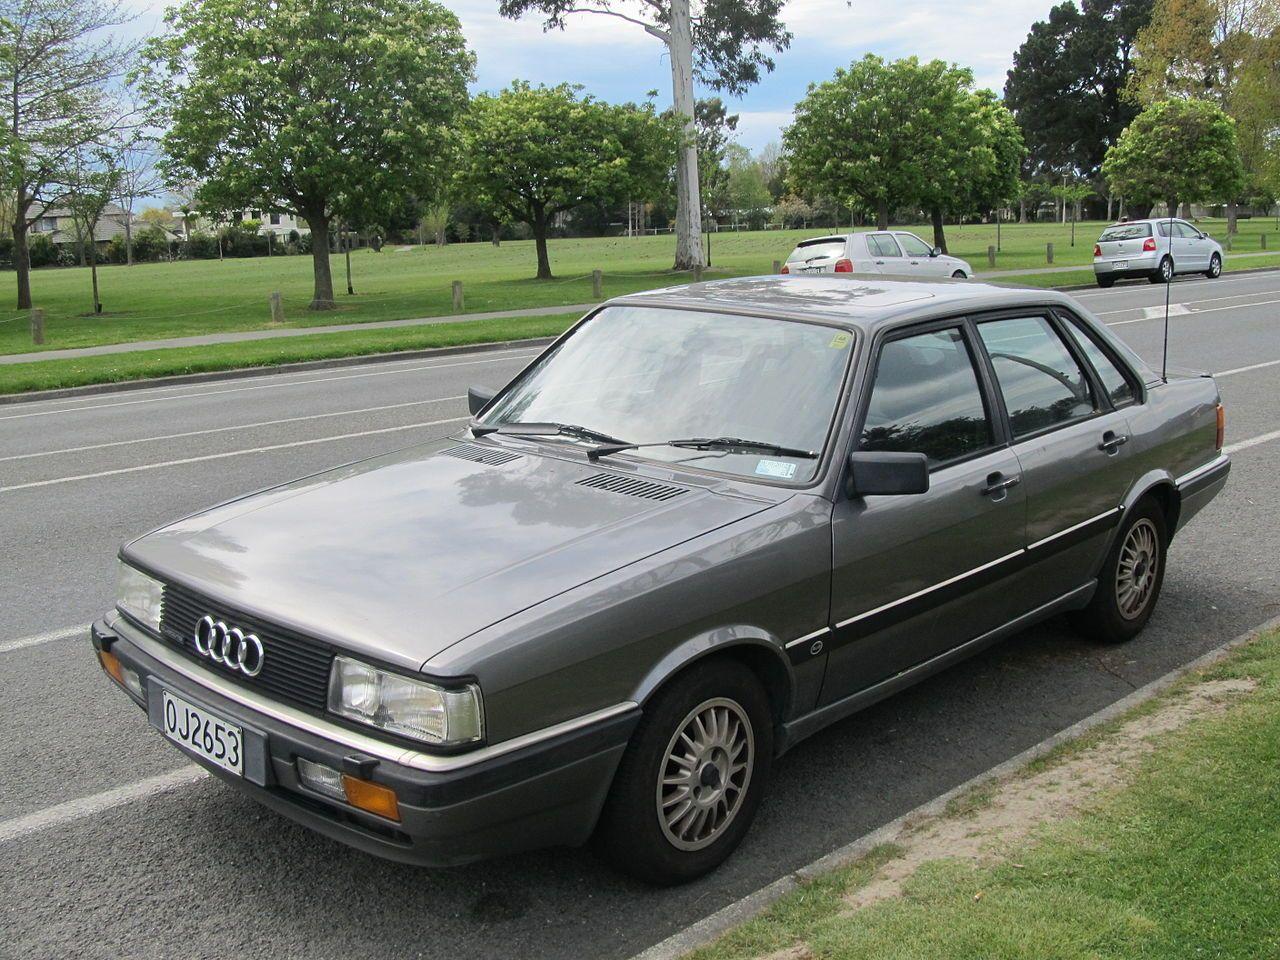 1985 Audi 90 Quattro (8207180309) - Audi 80 B2 - Wikipedia ...